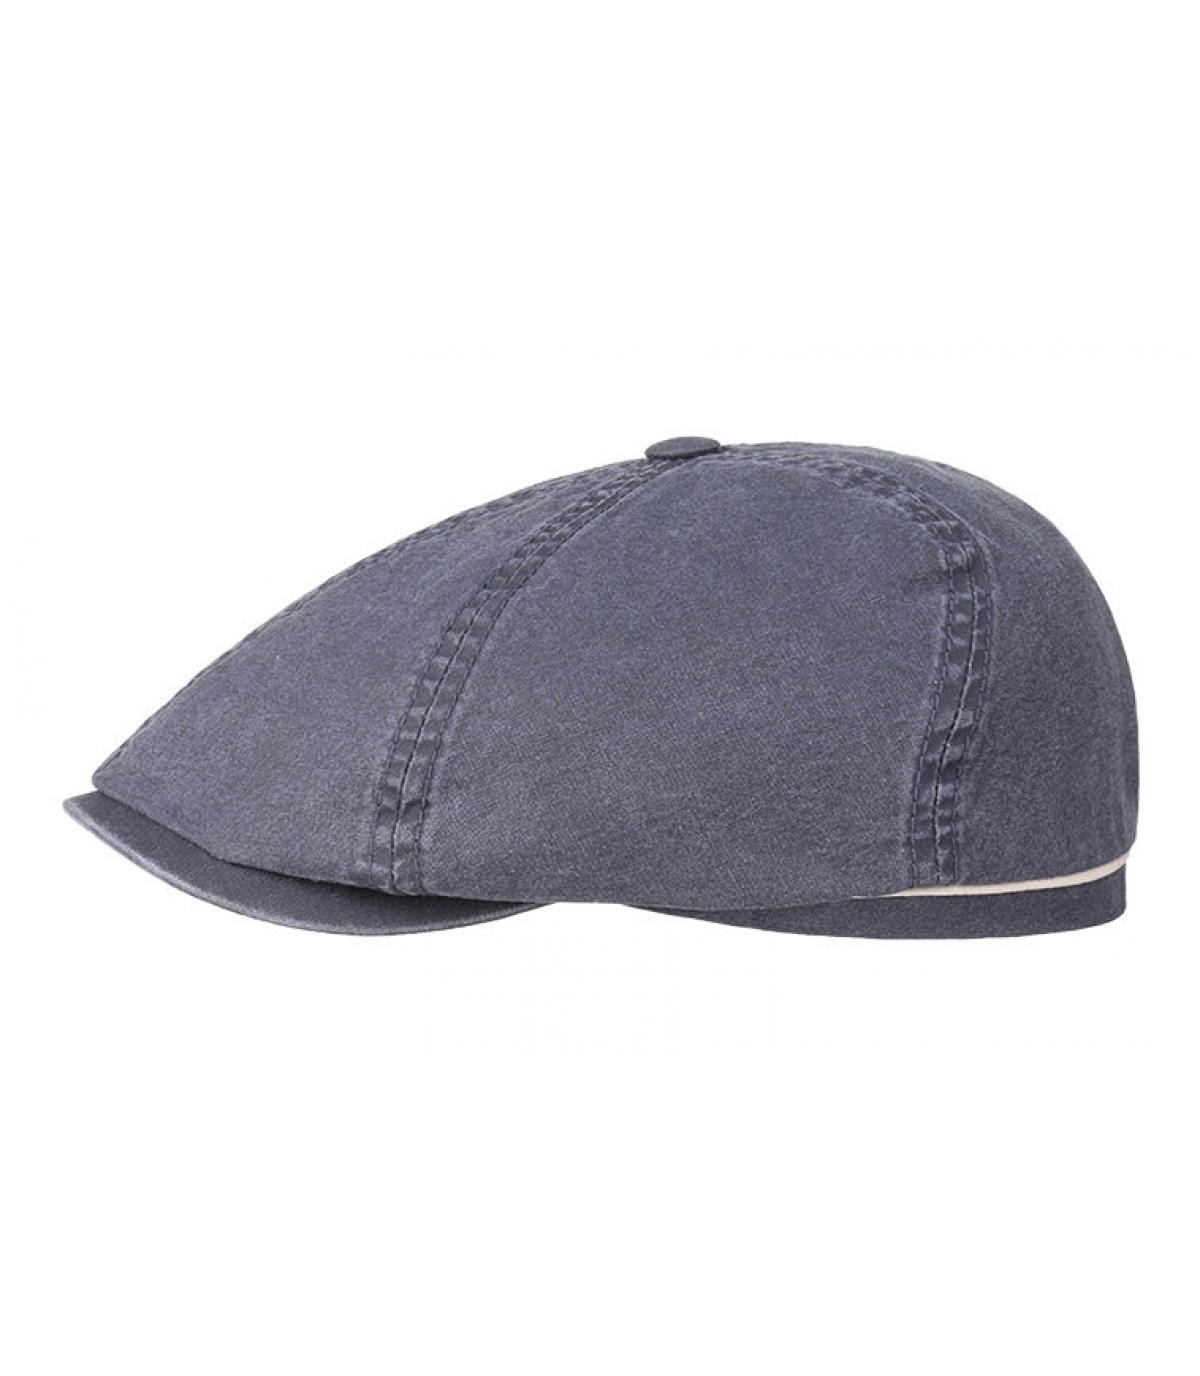 Dettagli Brooklyn cap waxed cotton organic blue - image 2